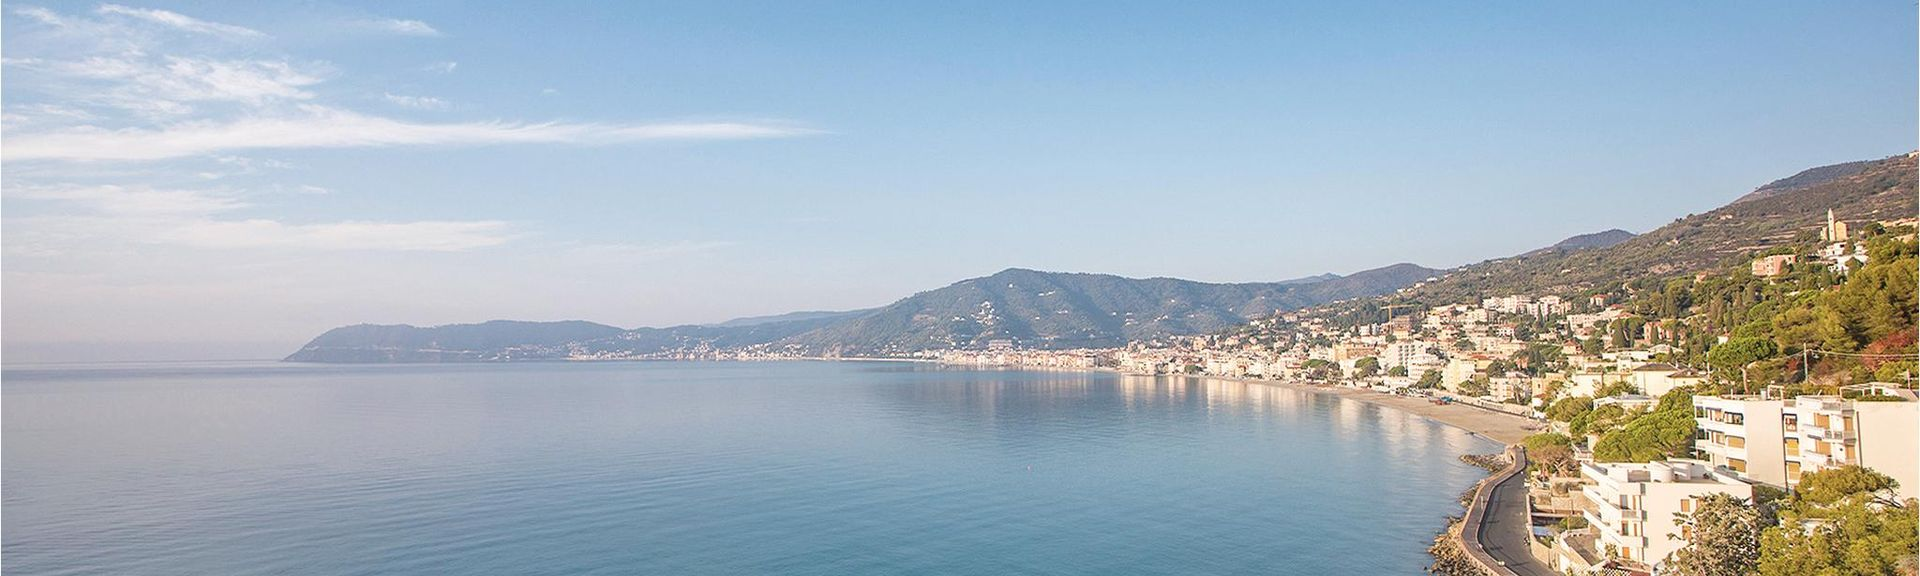 Cogoleto, Metropolitan City of Genoa, Liguria, Italy